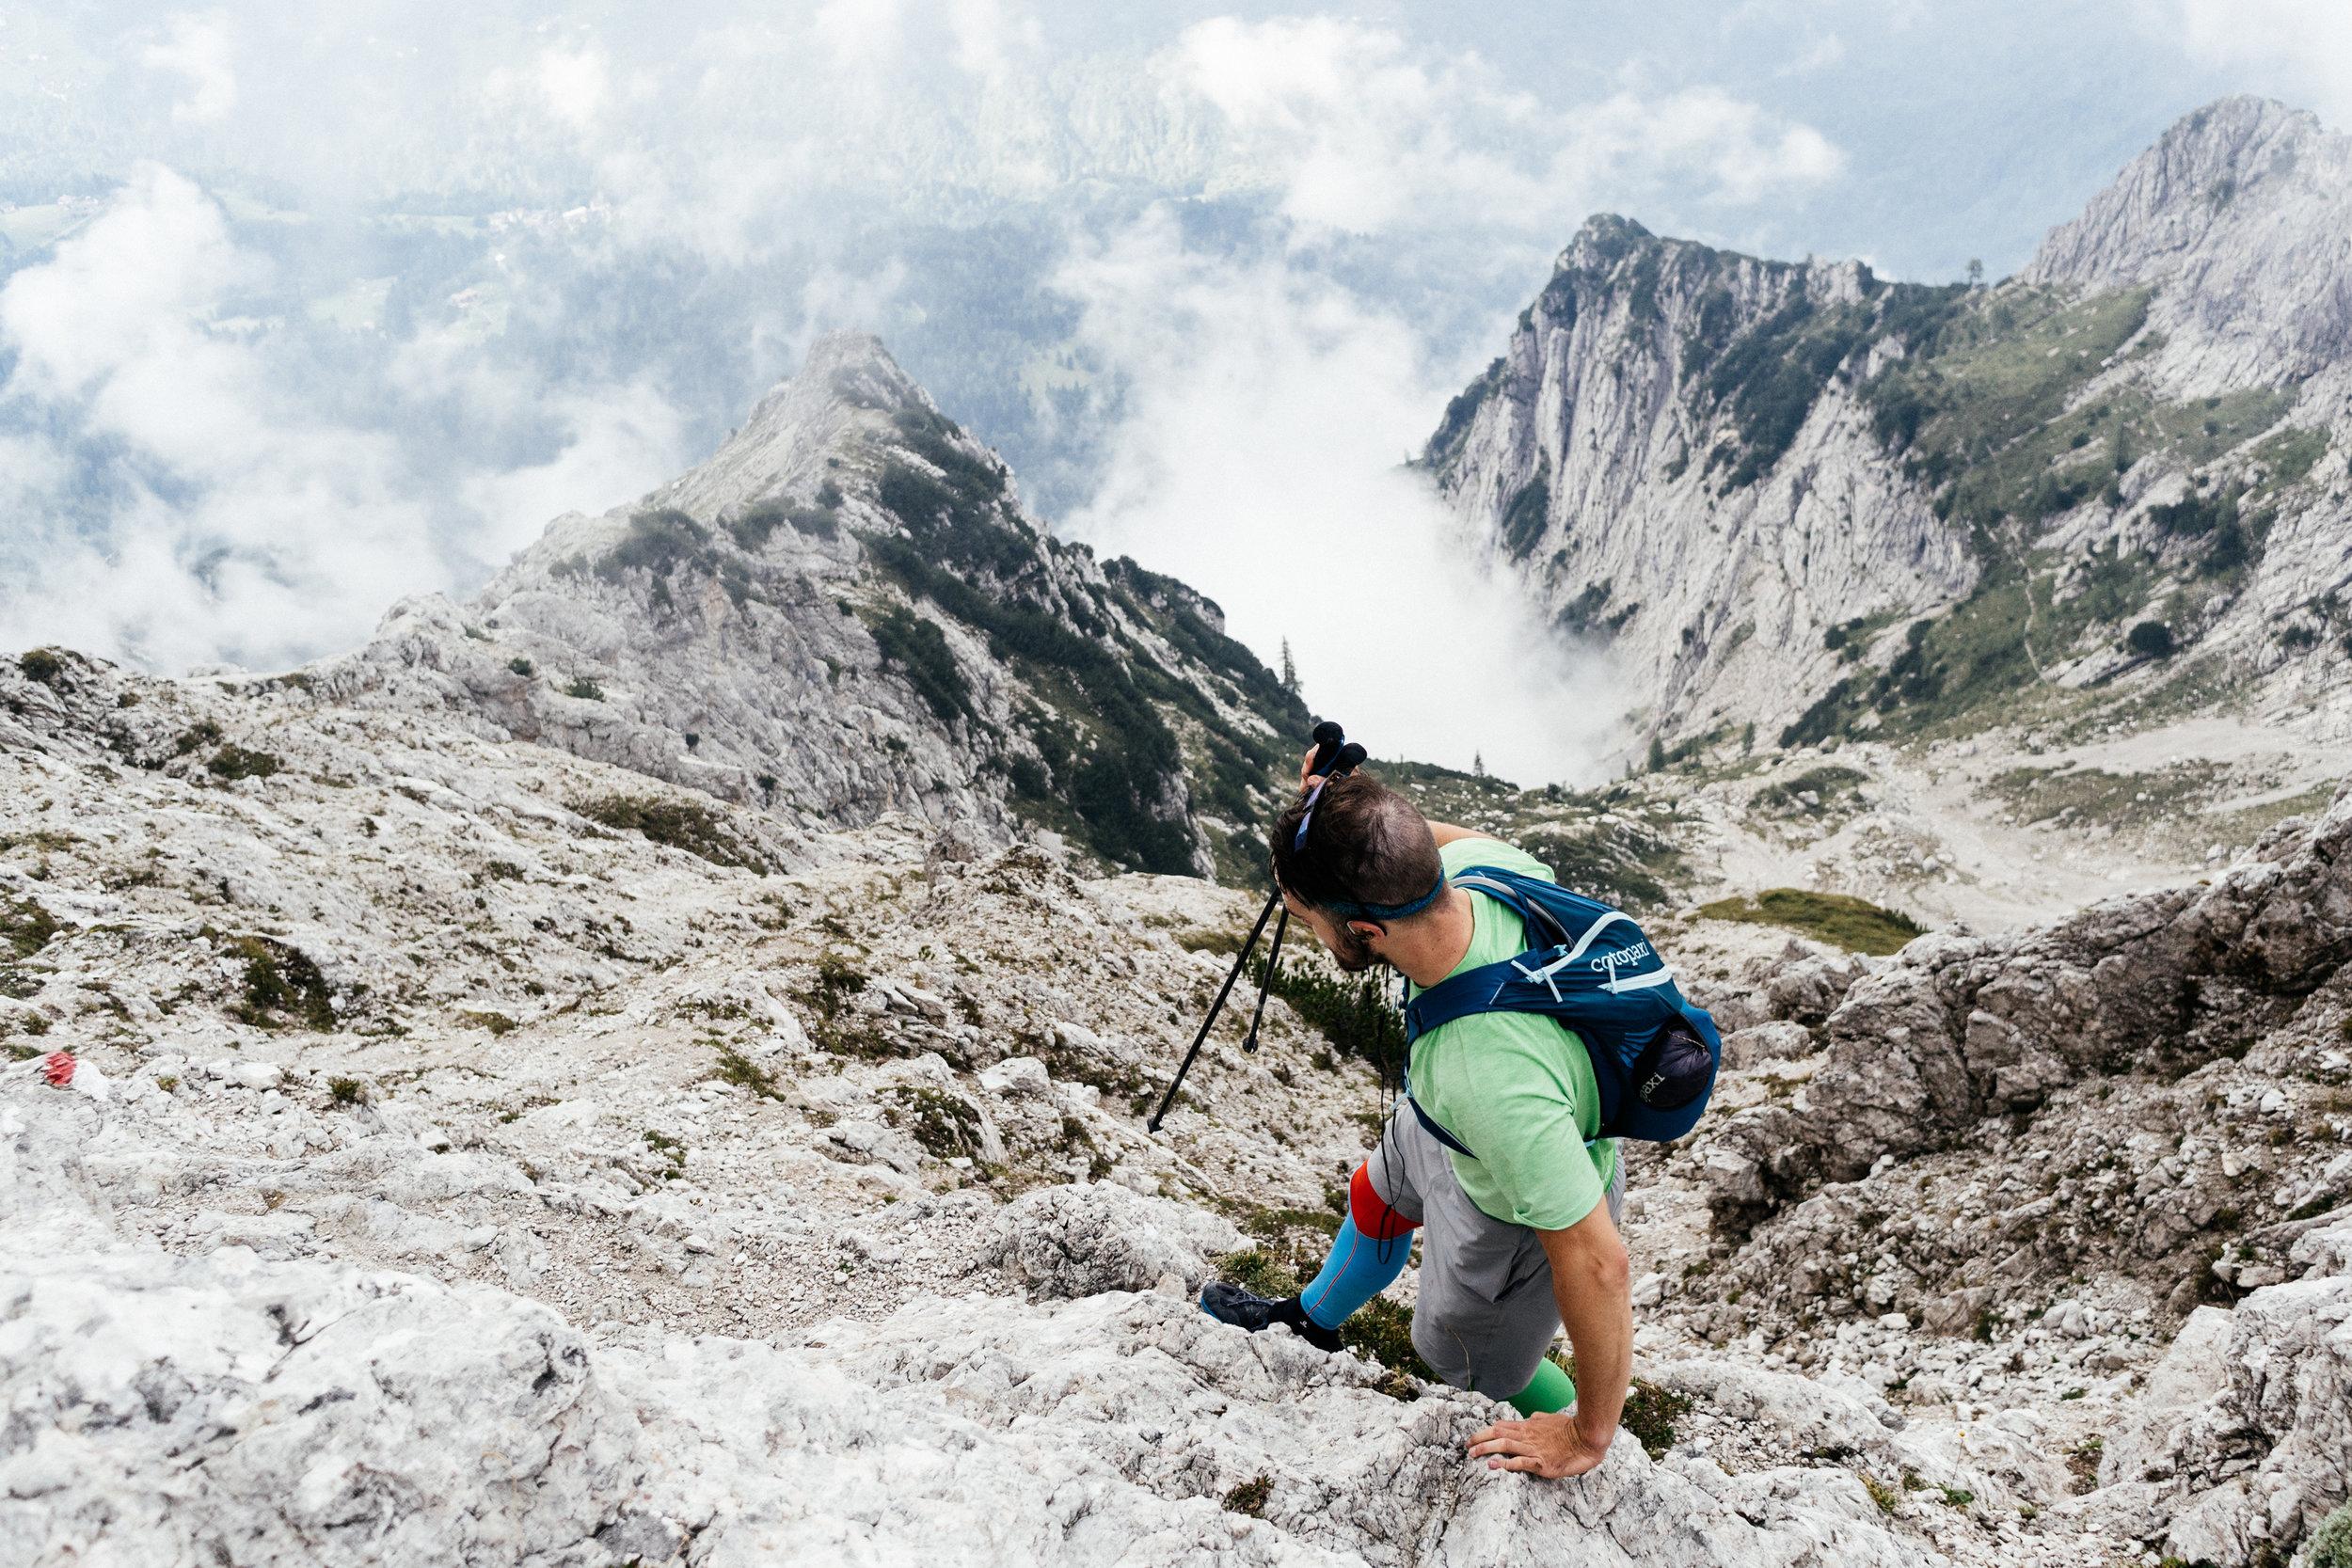 Dolomites-ChrisBrinleeJr-SEP17-23.jpg